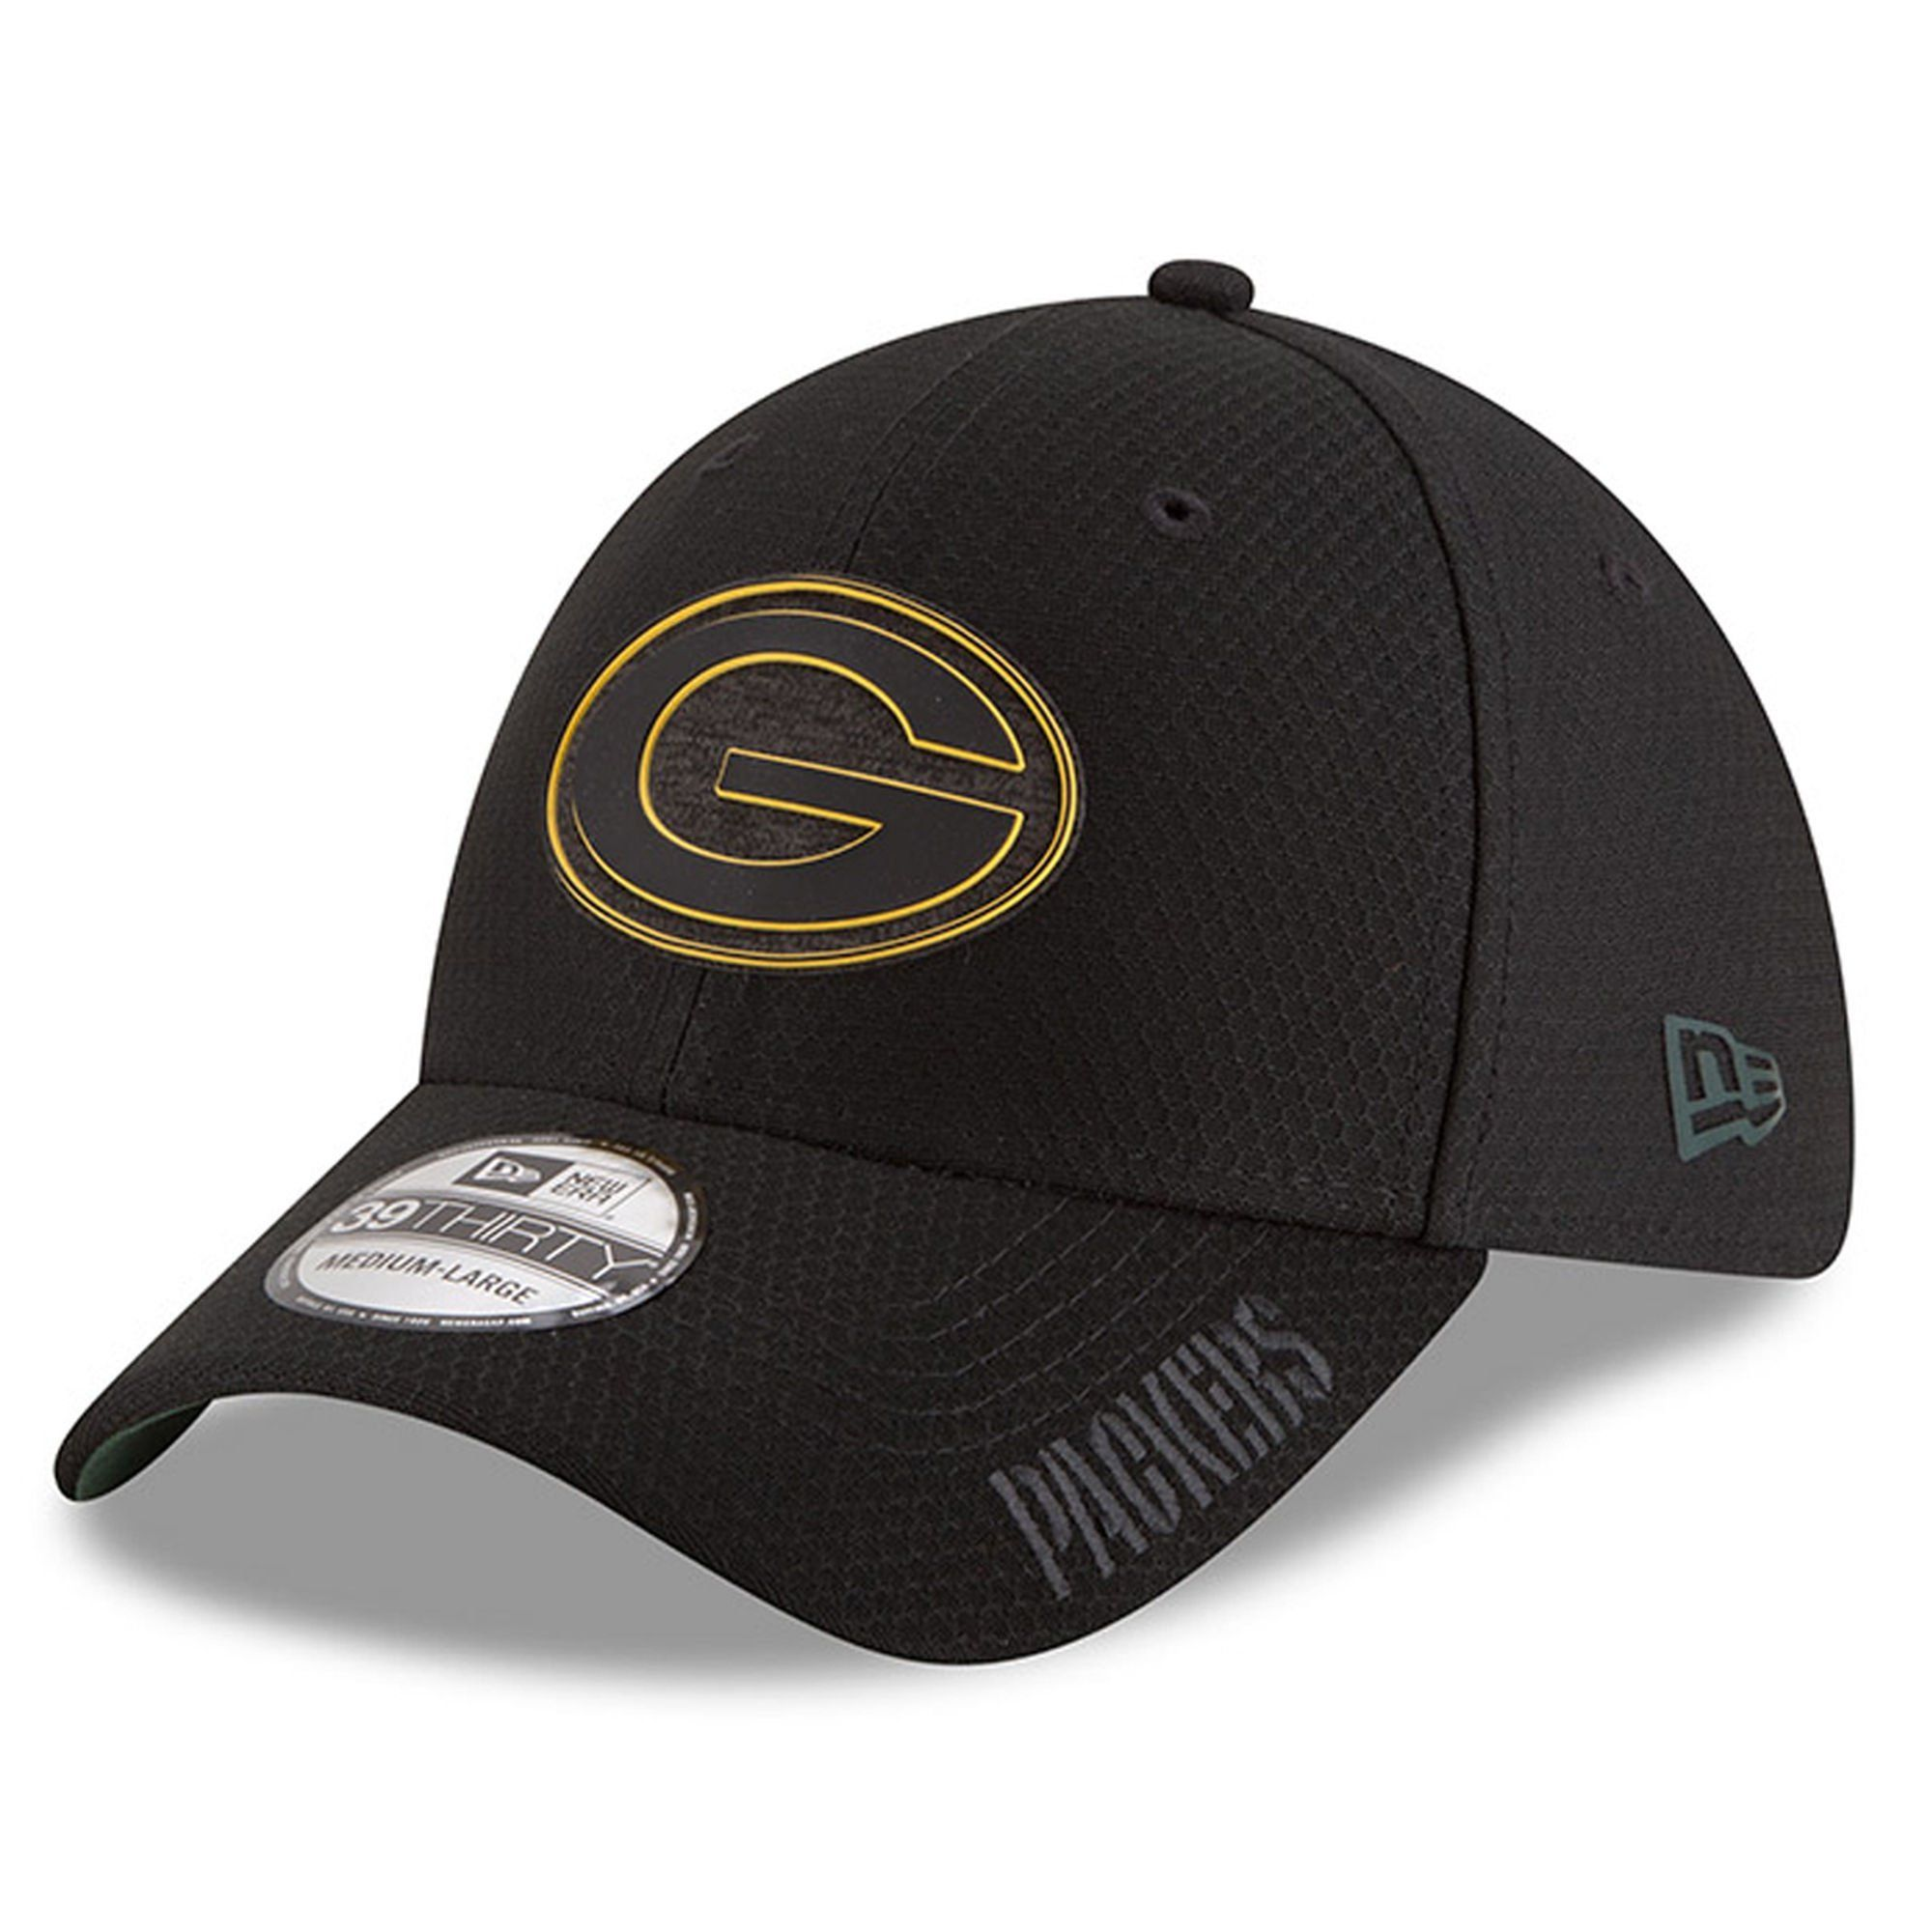 266975c5f11 Men s Green Bay Packers New Era Black 2018 Training Camp 39THIRTY Flex Hat